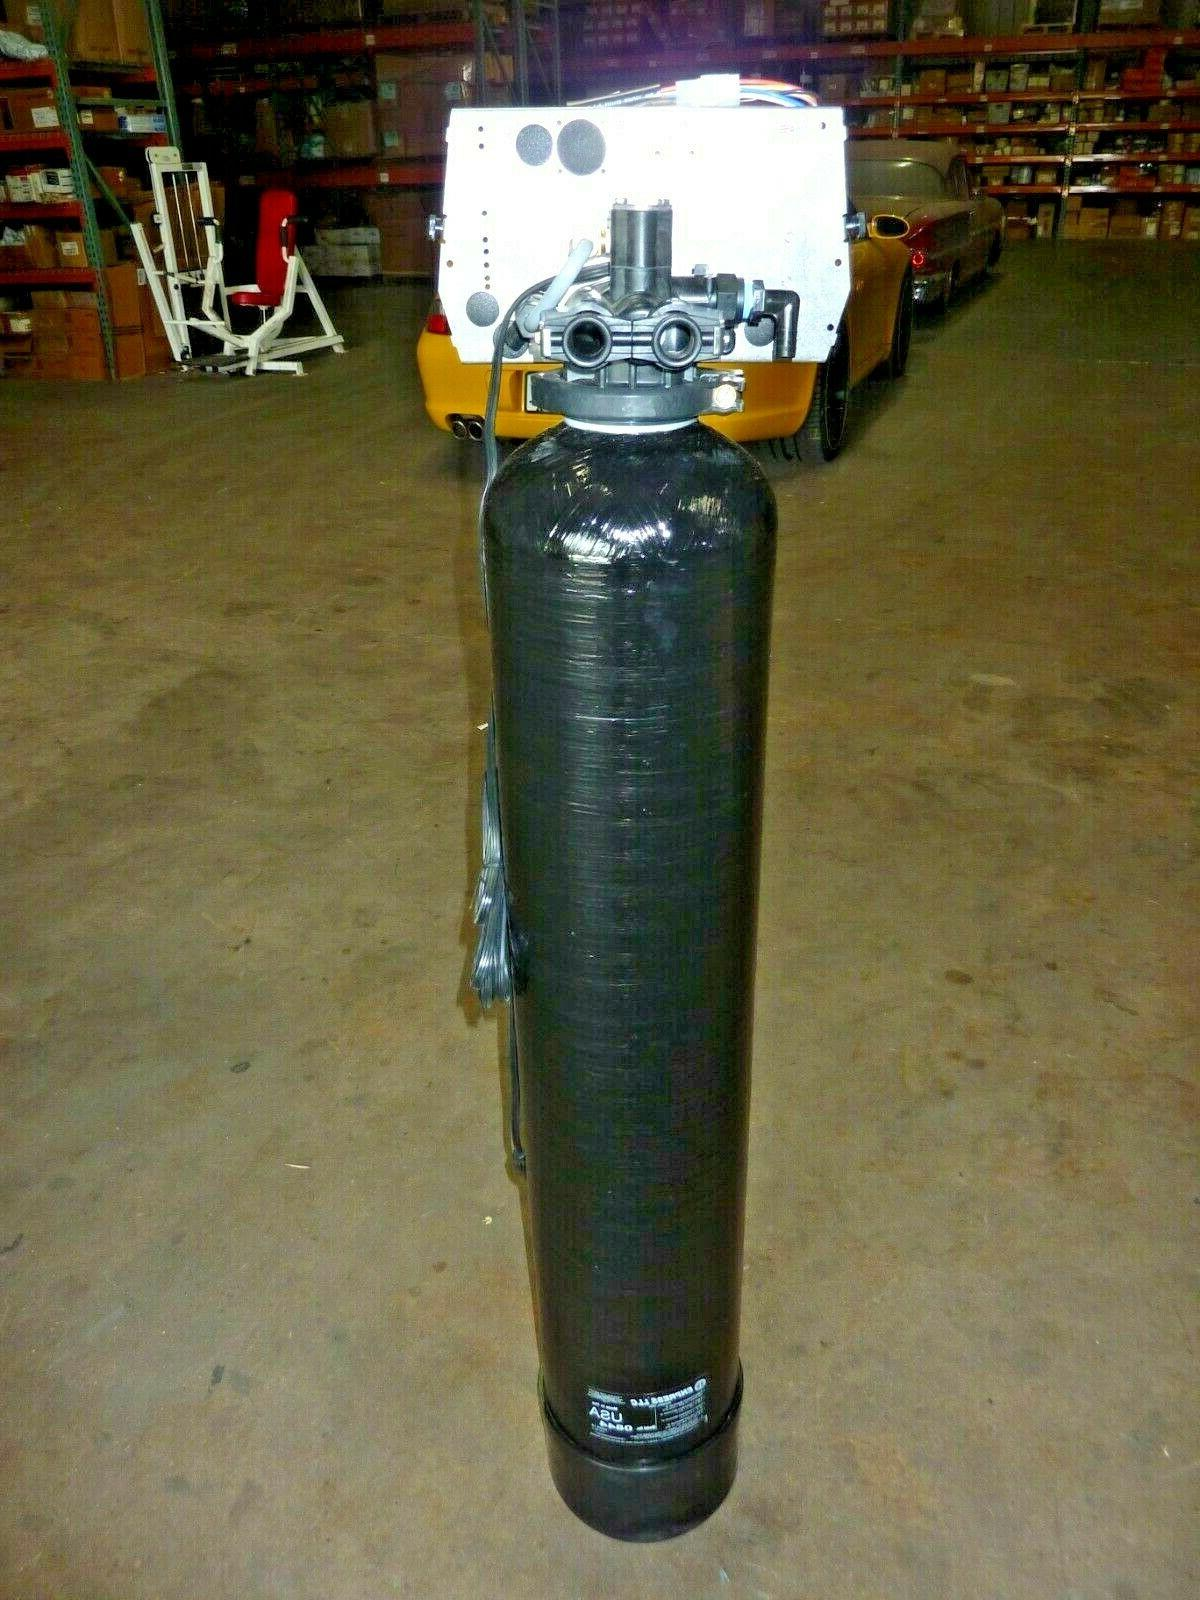 new aqua well water filter 20 125psi